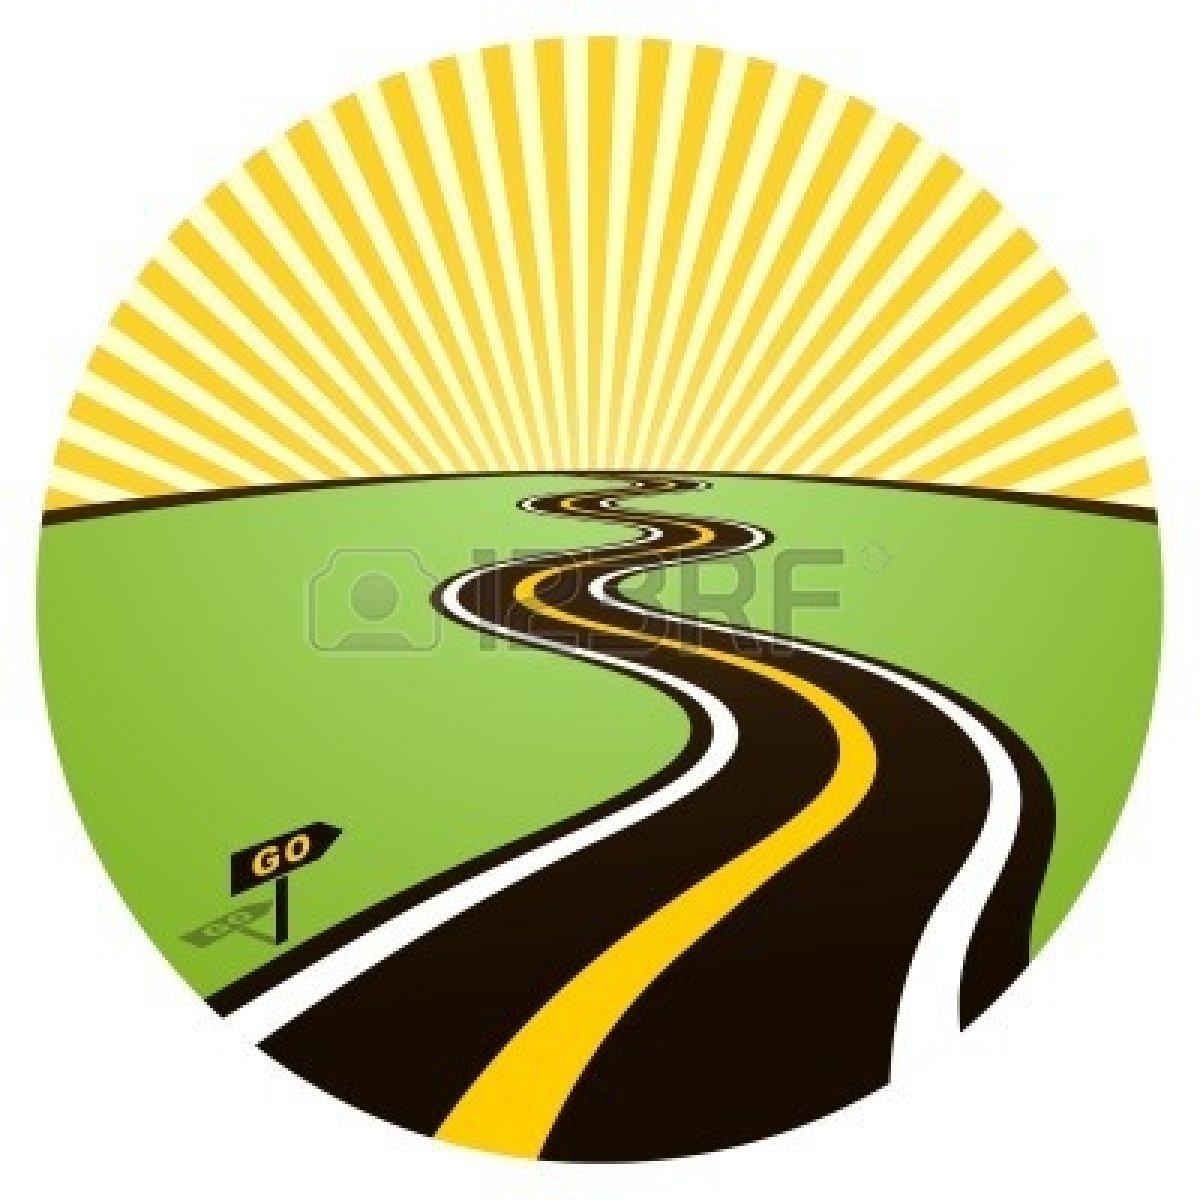 Curvy Highway Clipart.